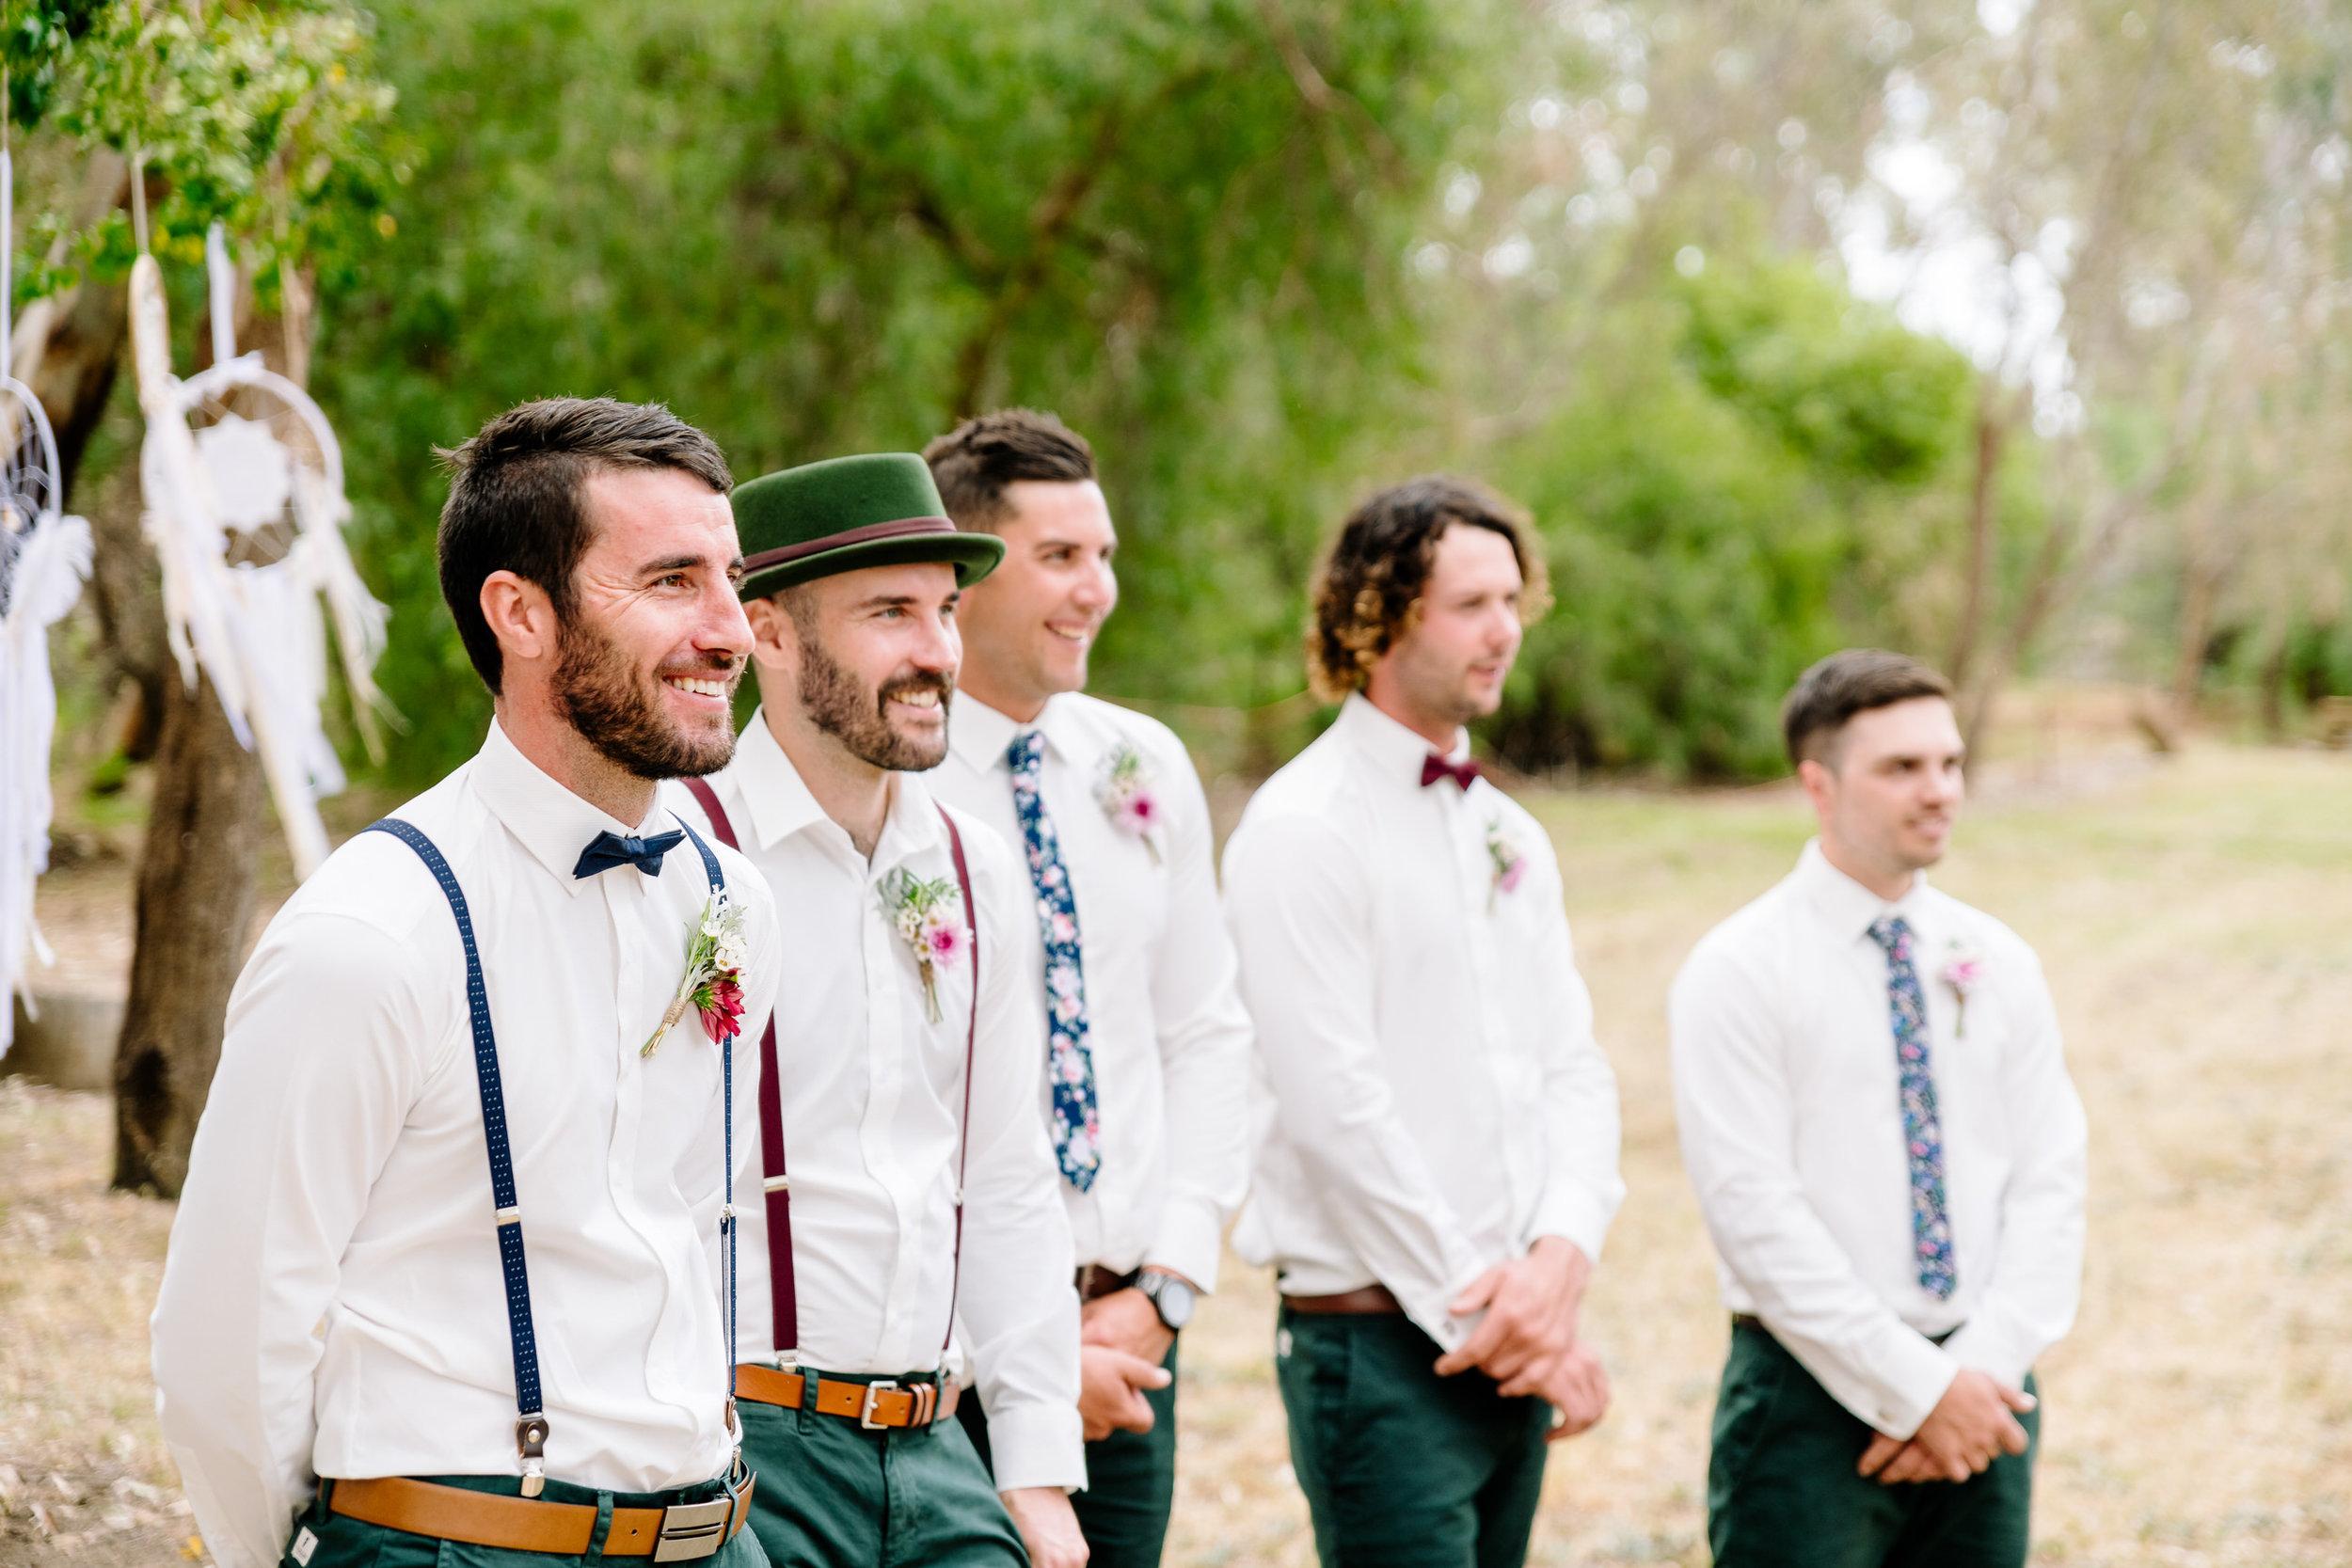 Justin_And_Jim_Photography_Backyard_Wedding164.JPG